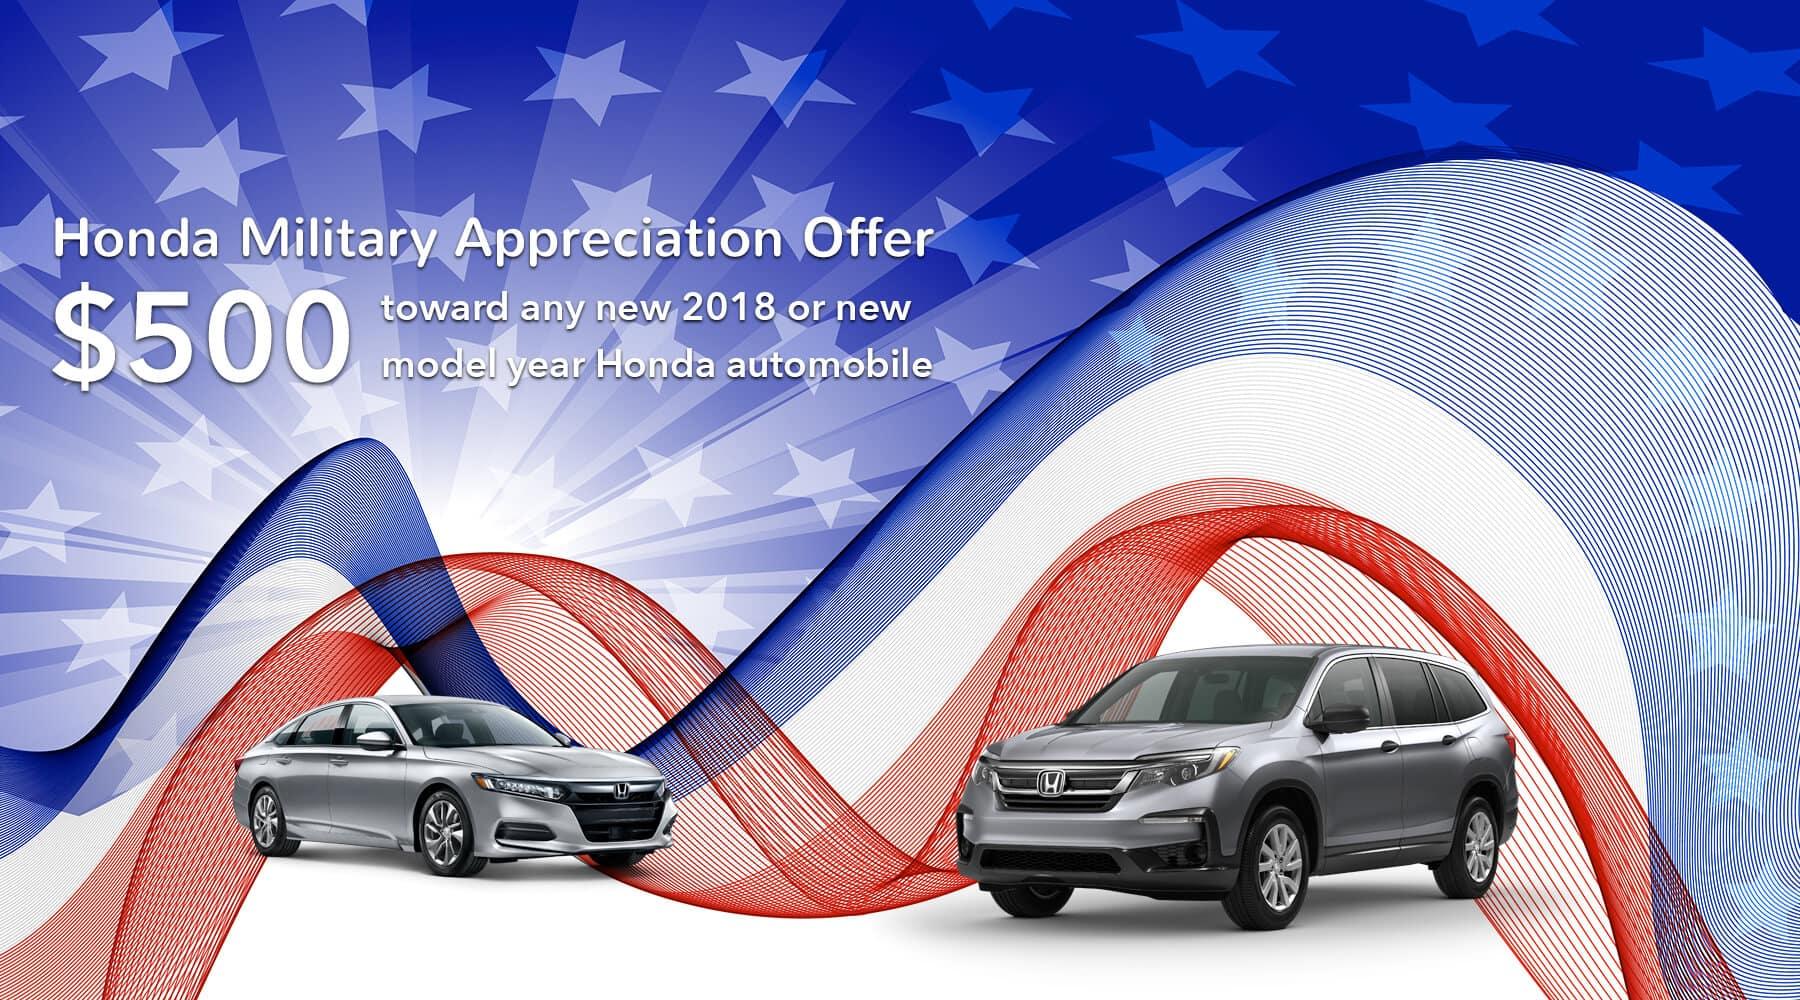 Honda Military Appreciation Offer Hawaii Honda Dealers HP Slide